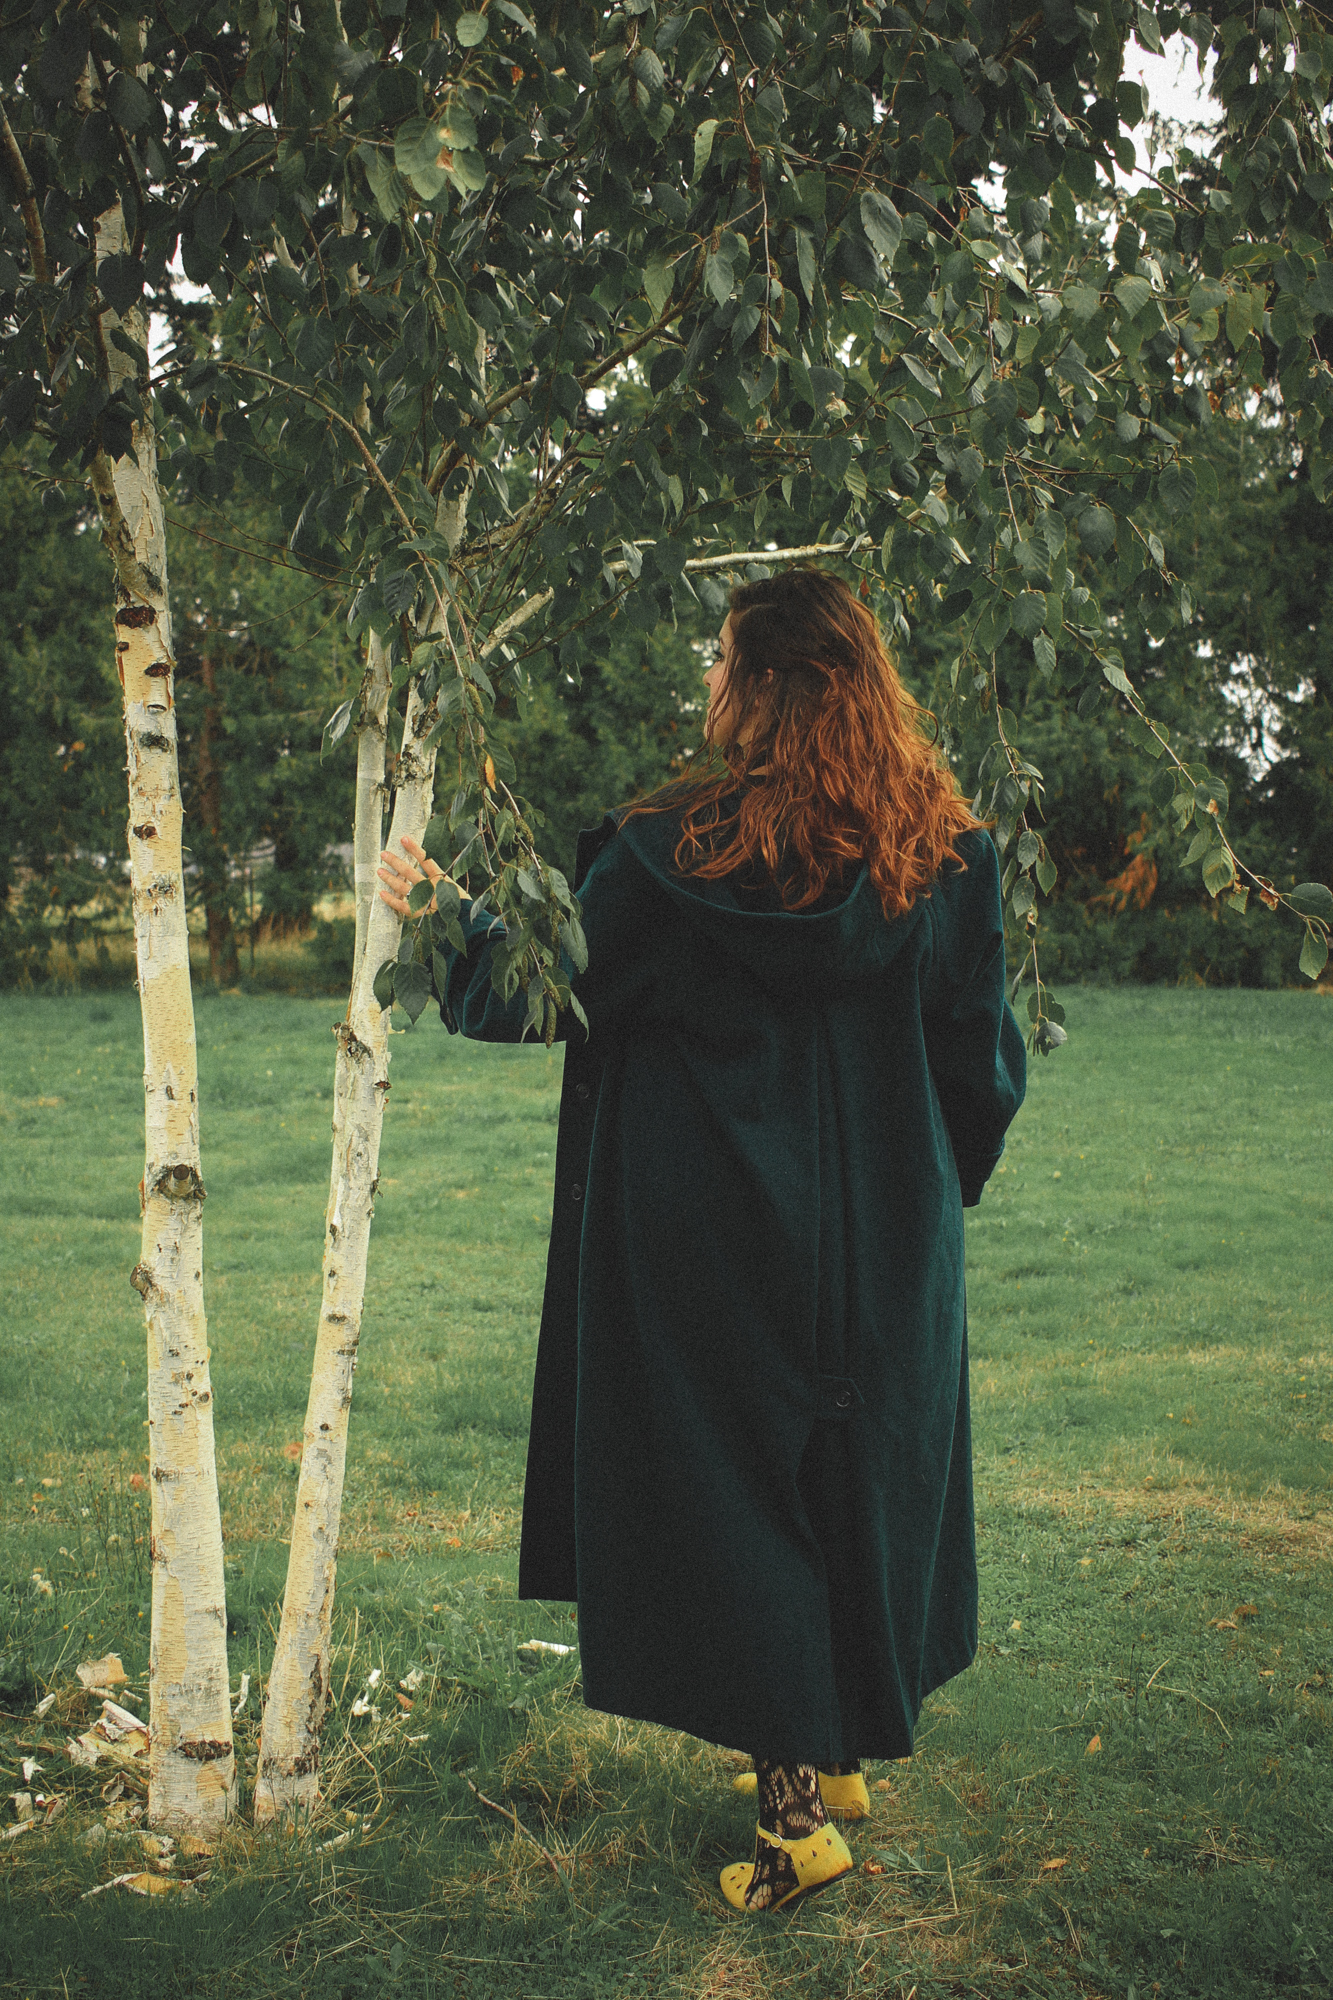 woman wearing a dark coat walking away